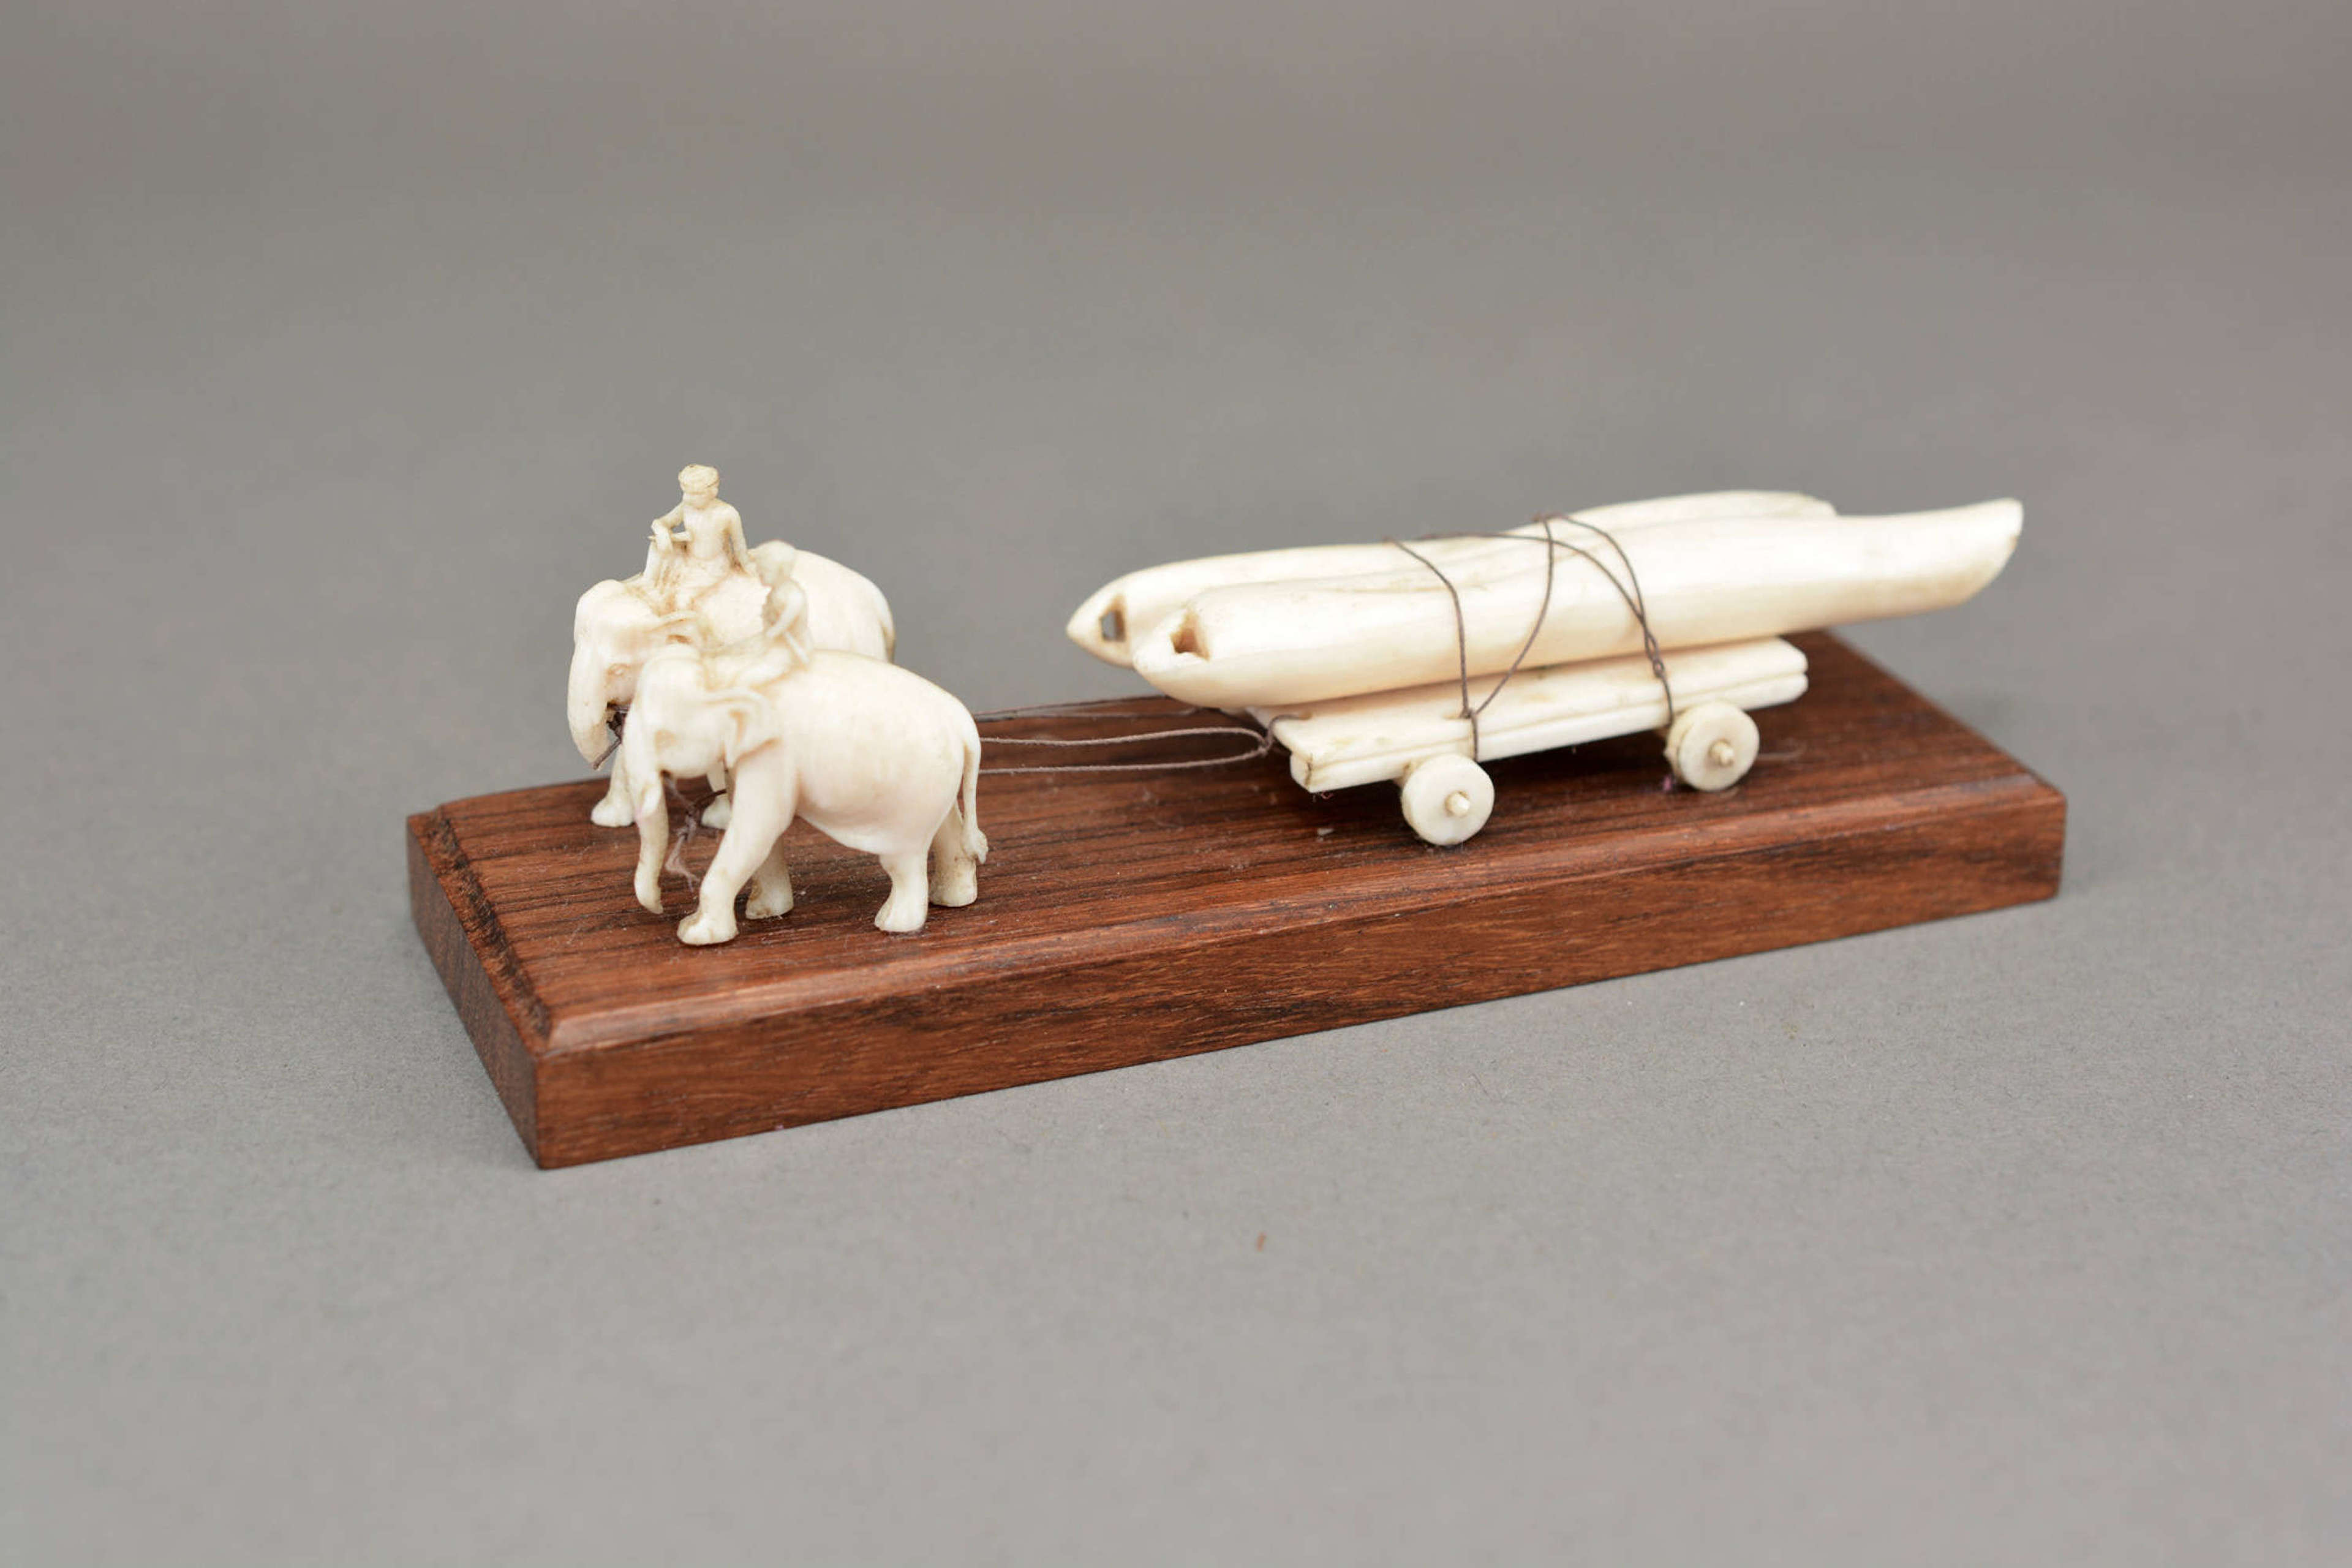 Hand carved model elephants pulling a log cart